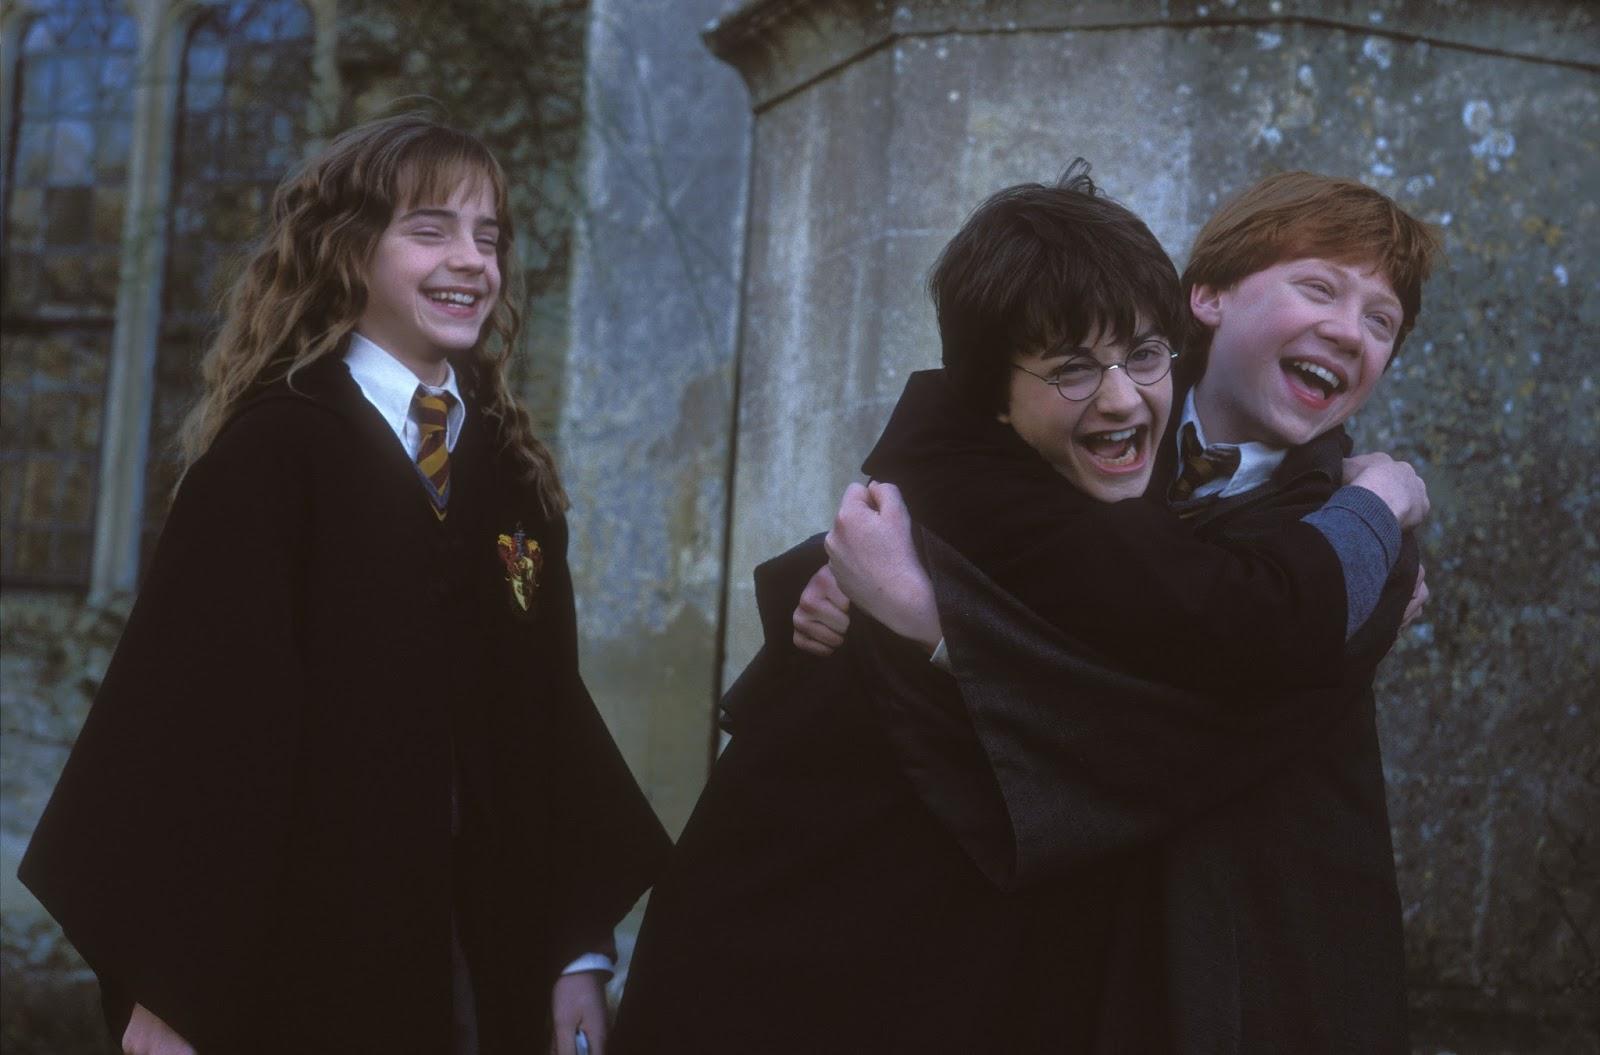 Harry Potter É A Pedra Filosofal throughout estante de opiniões: harry potter e a pedra filosofal